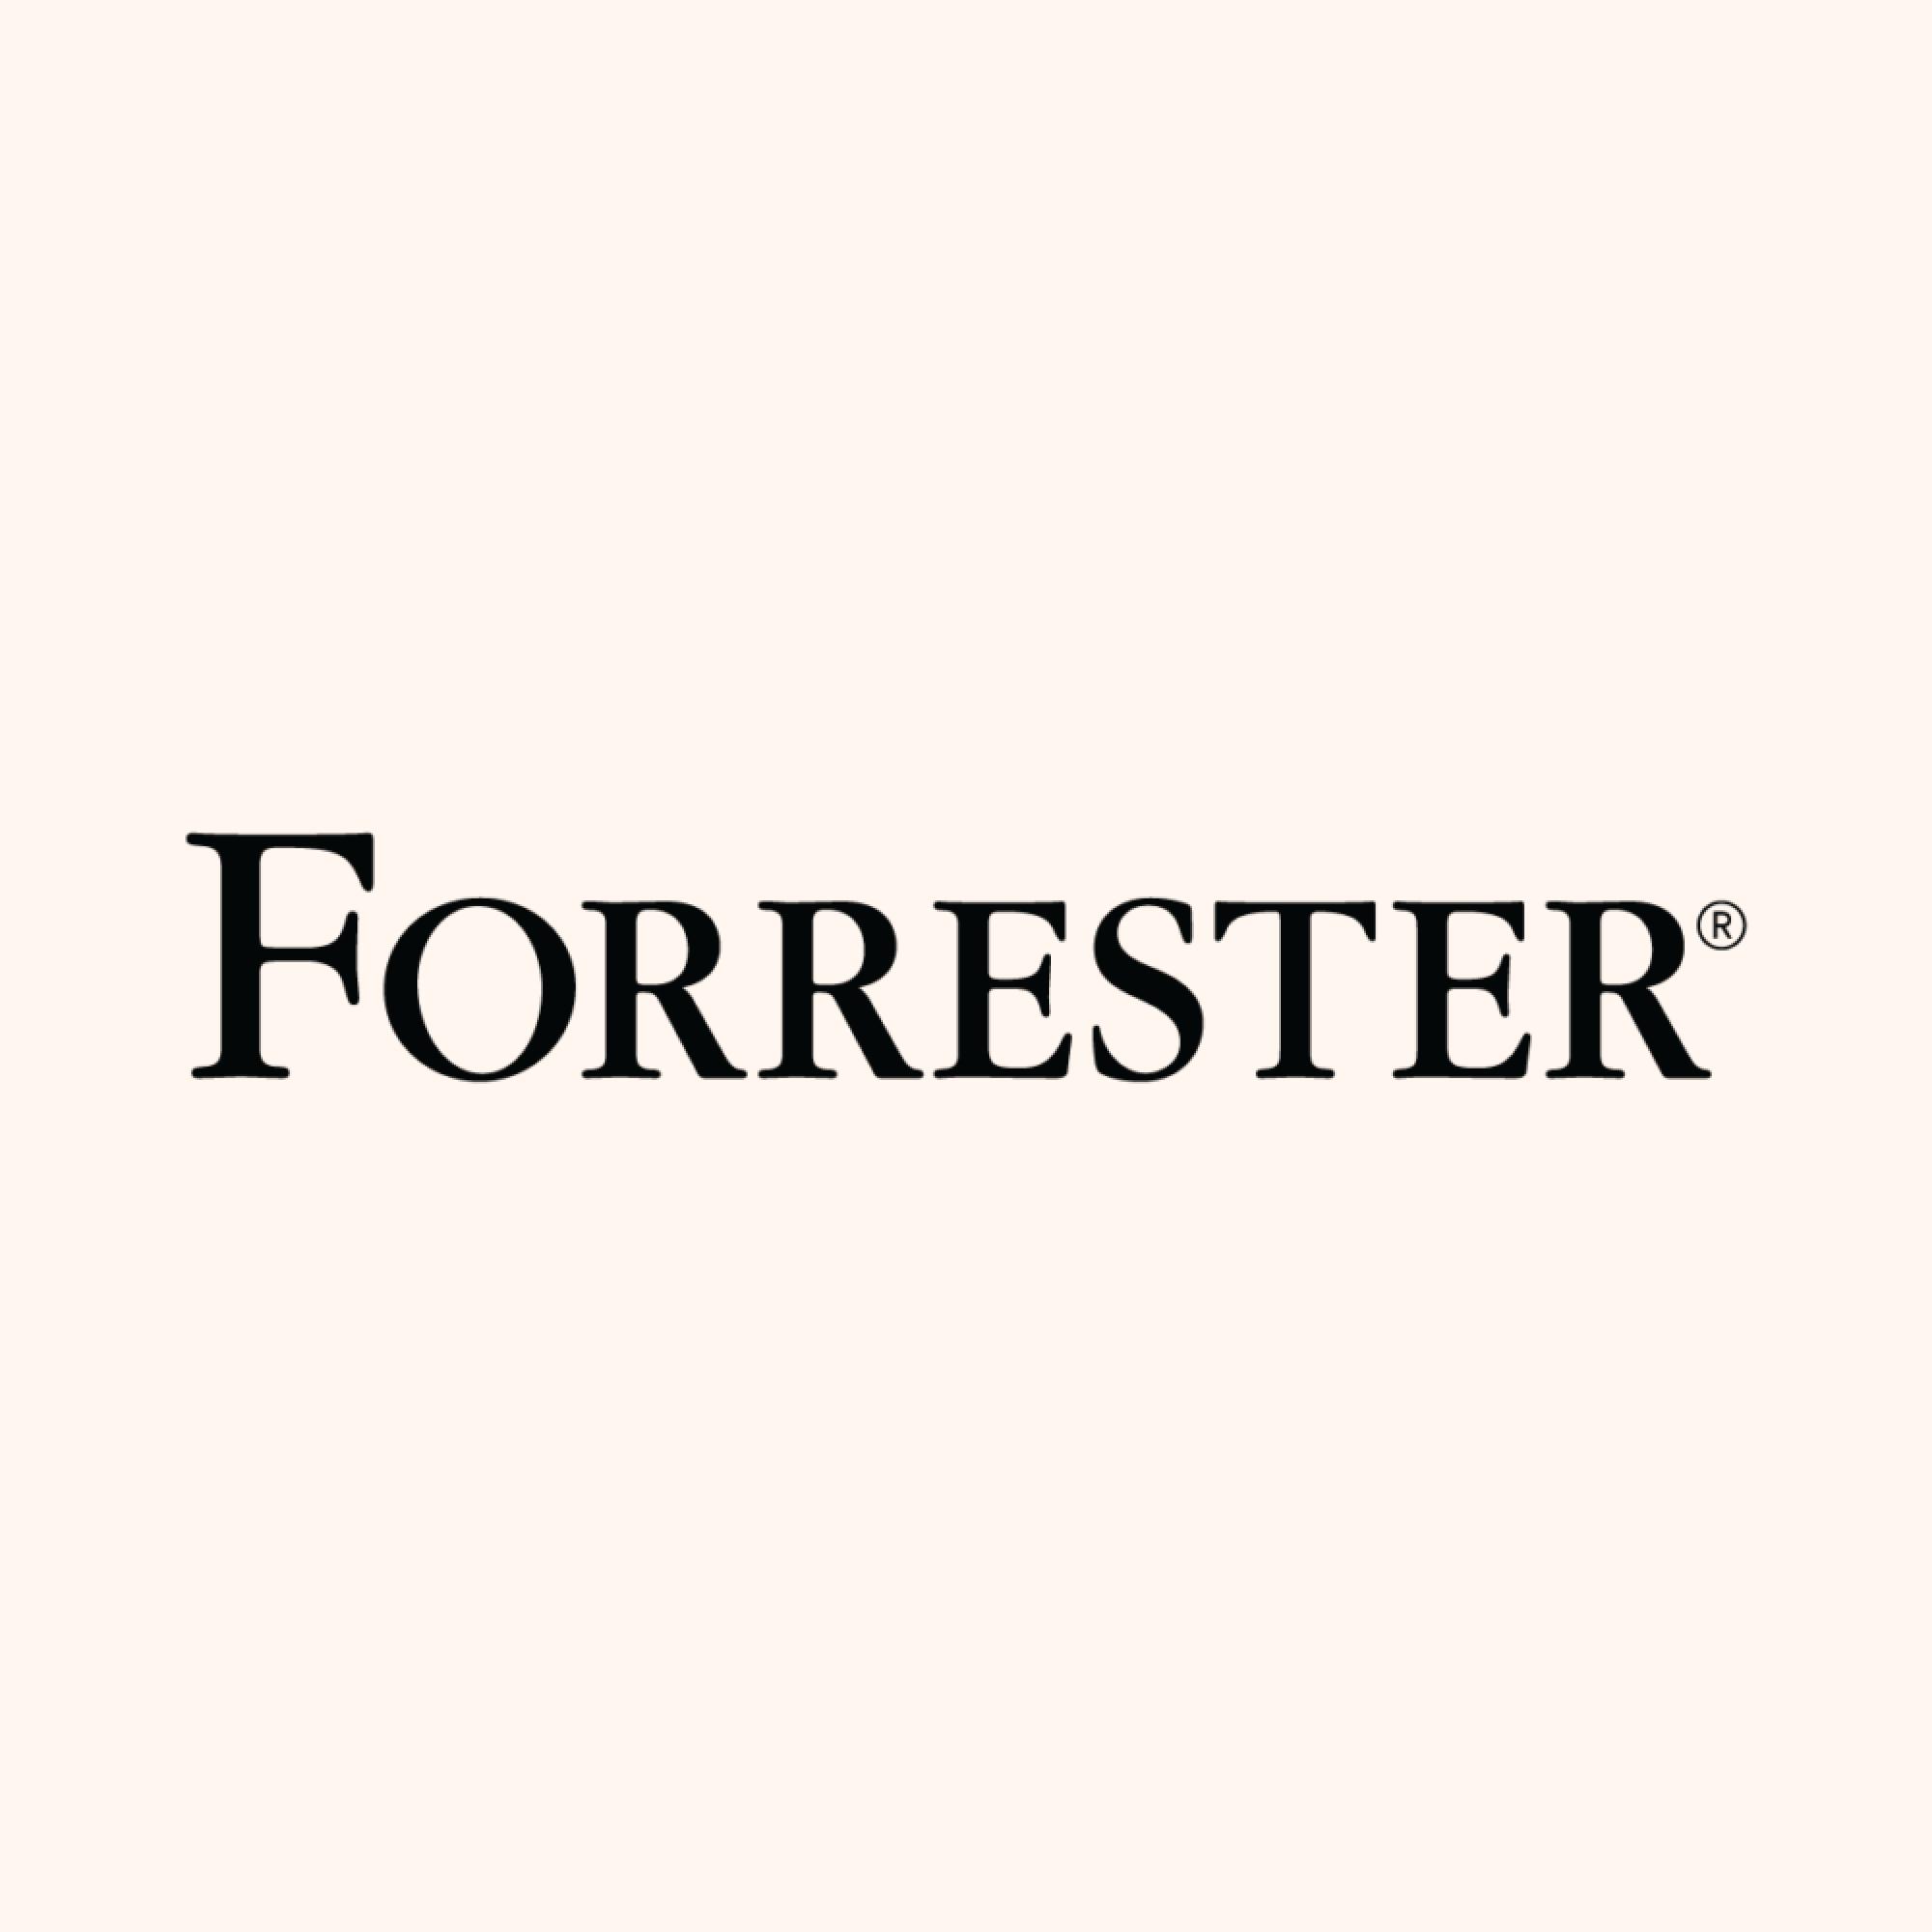 https://spotme.com/wp-content/uploads/2020/08/Forrester-logo-b2b-online-event-tech-report.png